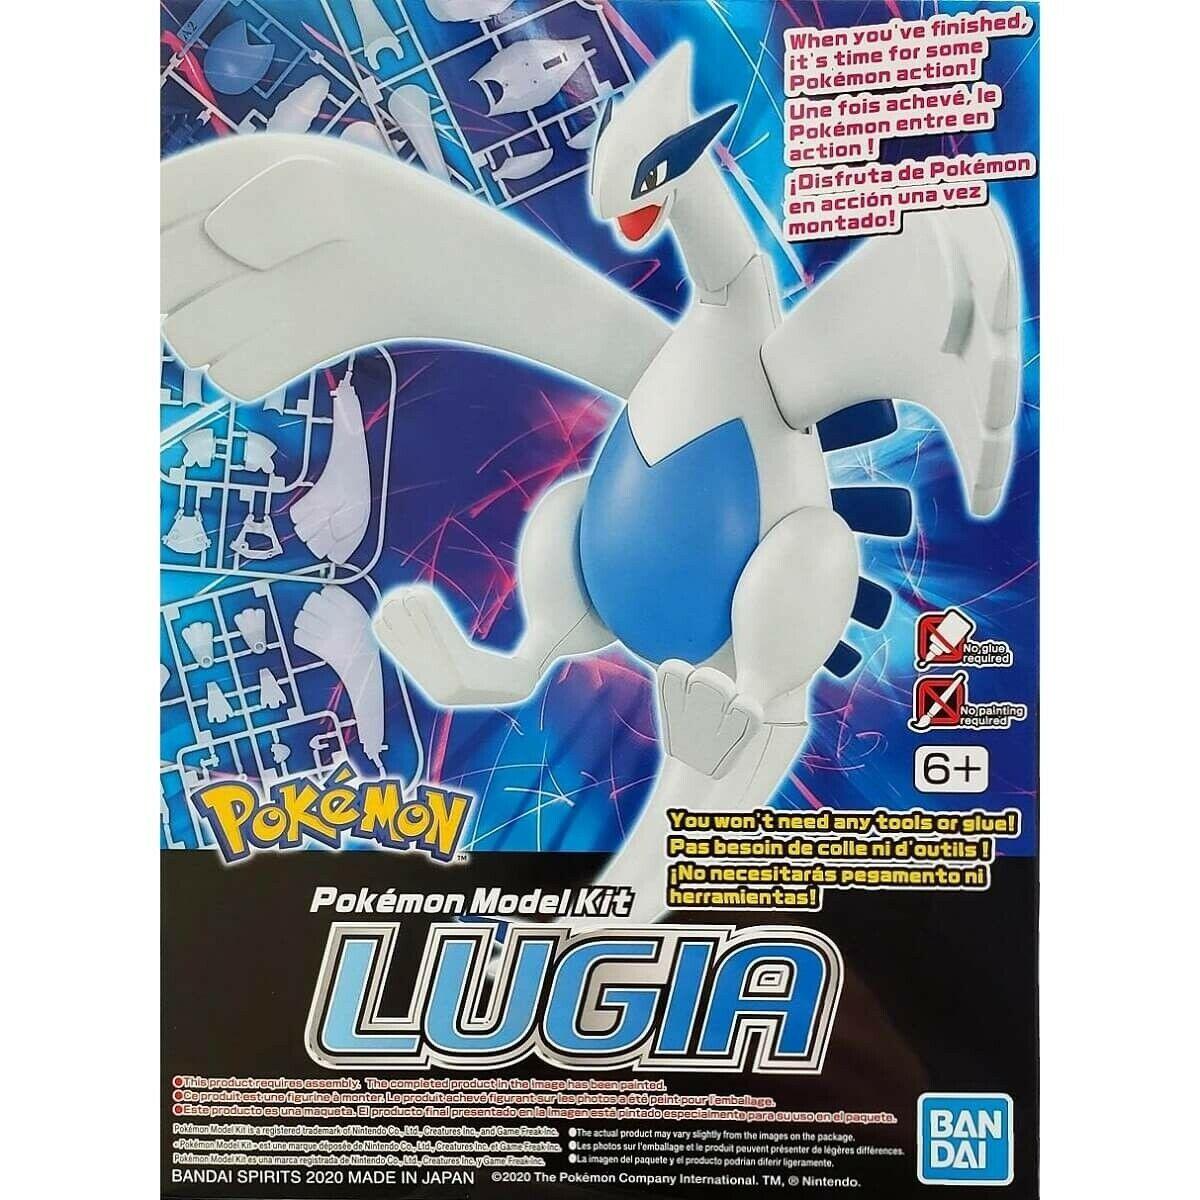 Bandai Spirits Pokemon Model Kit #04 Lugia